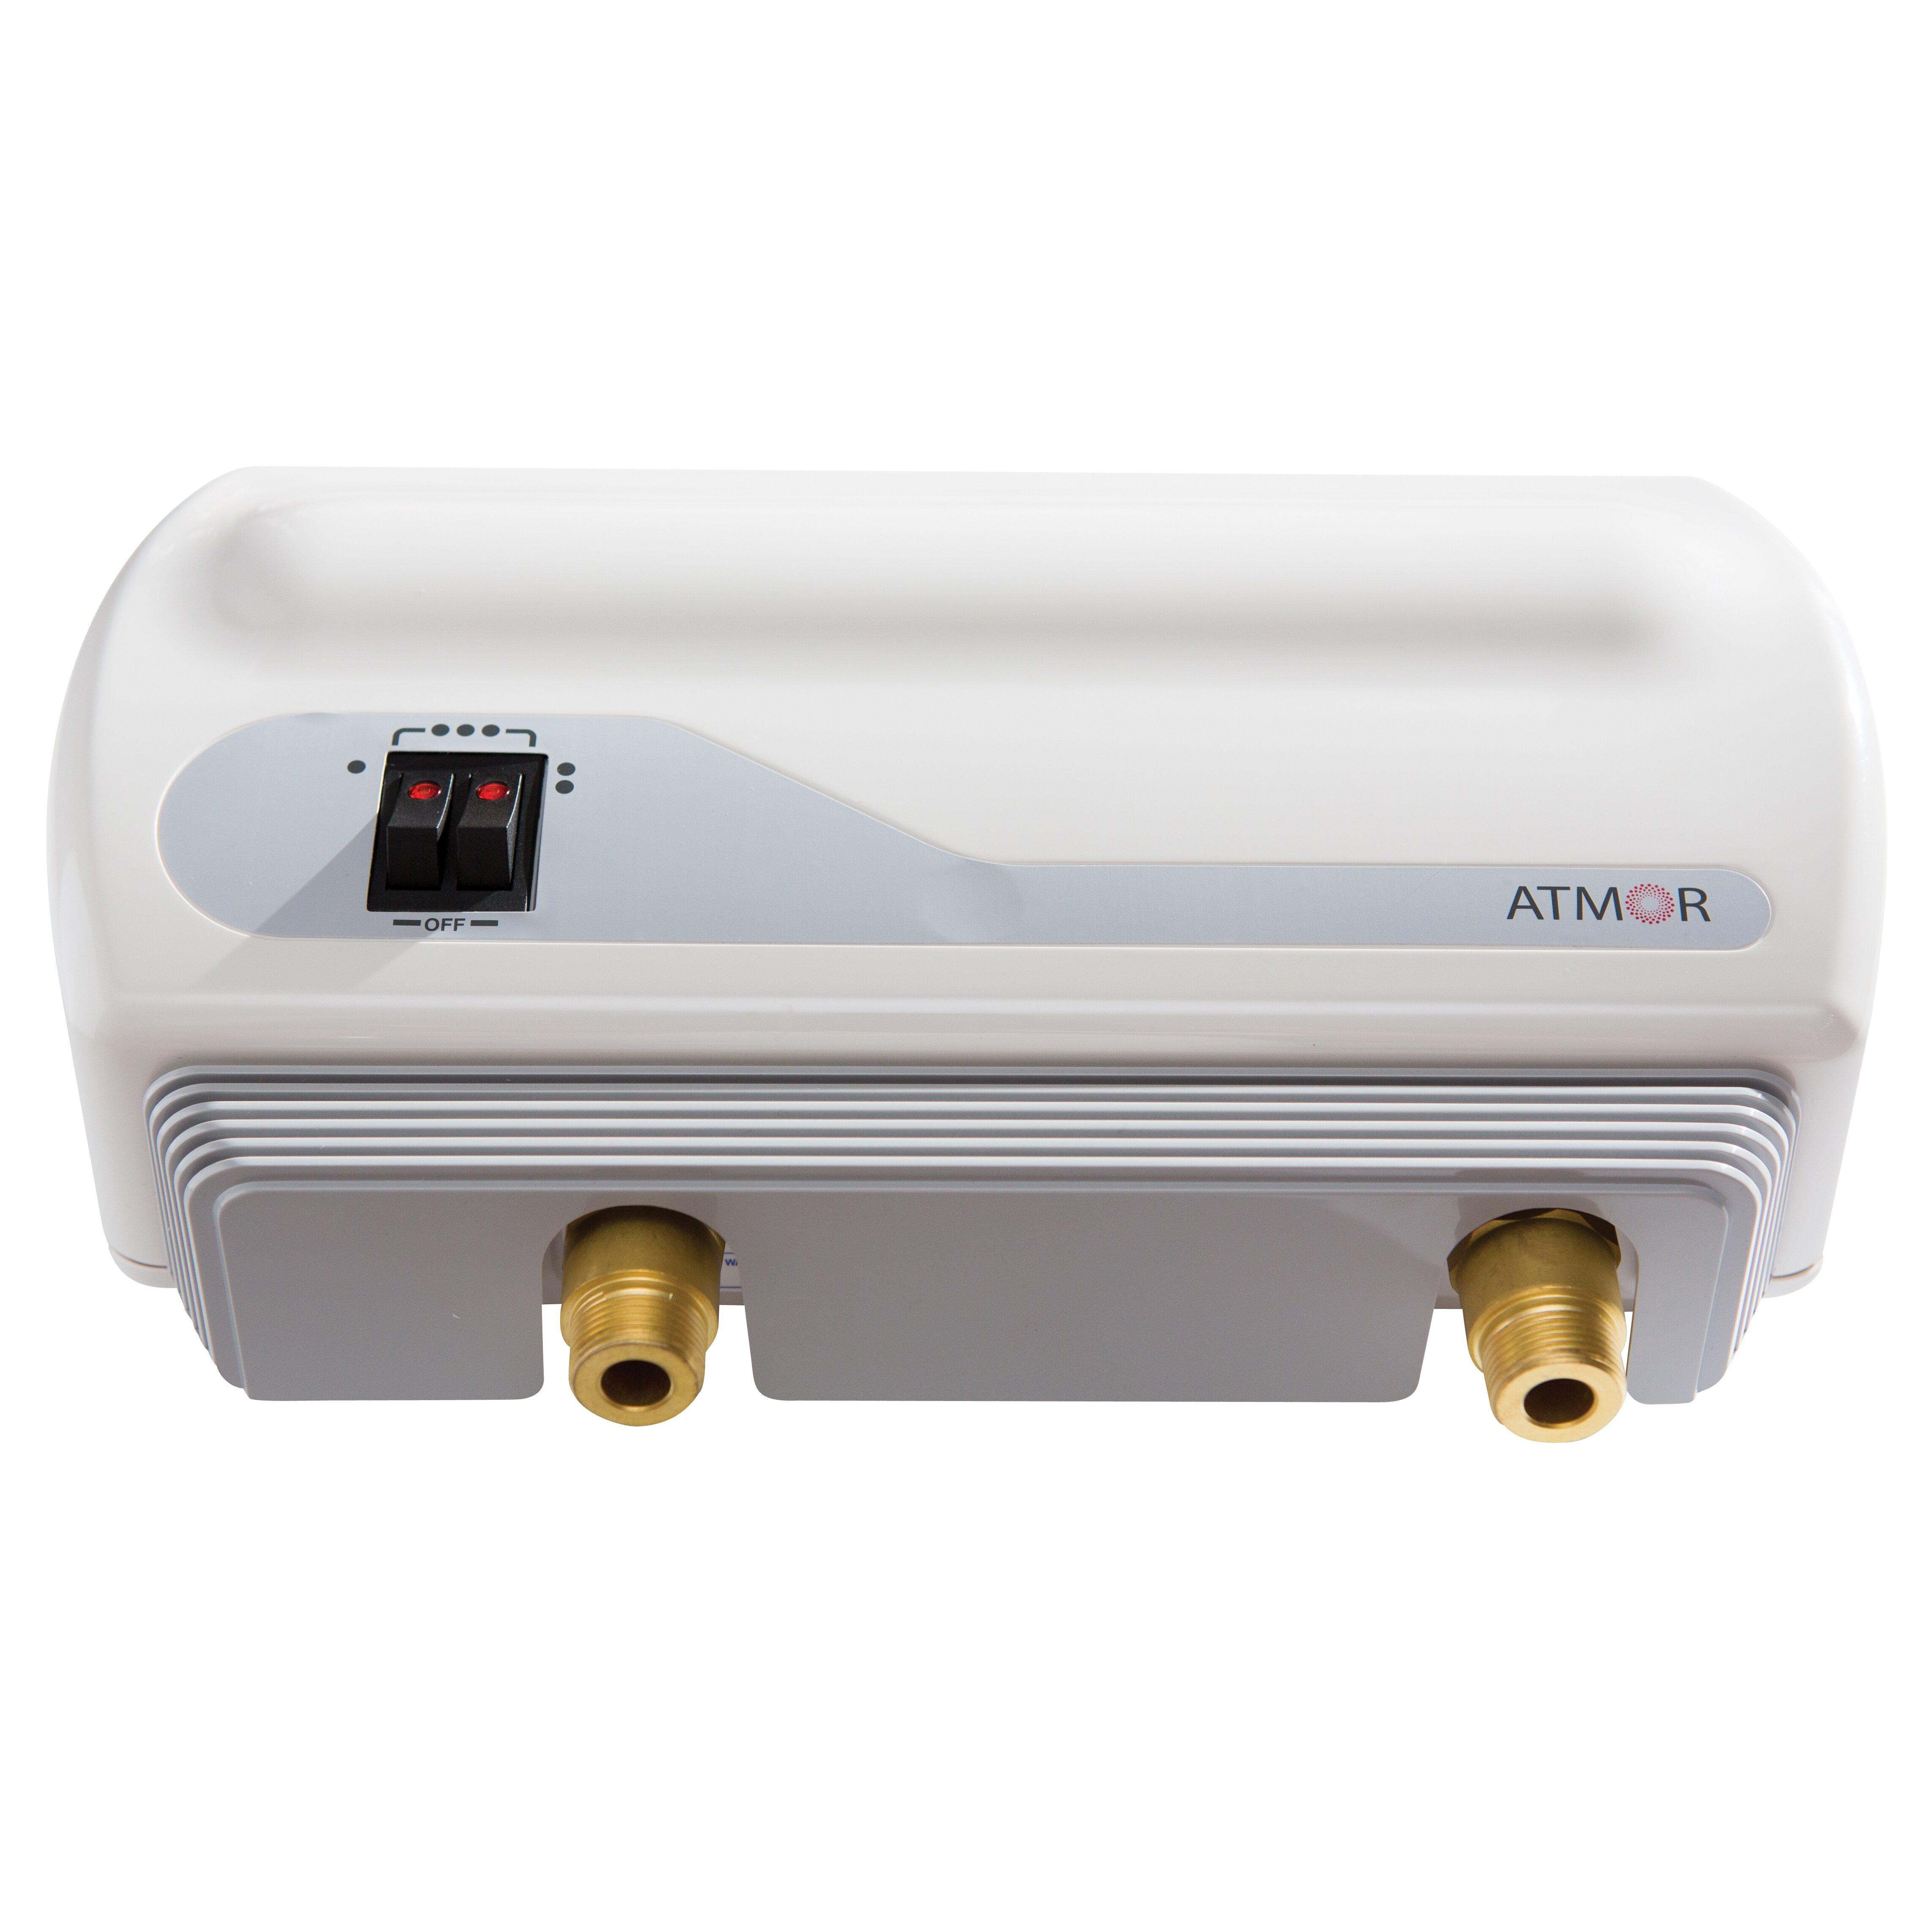 Atmor industries ltd super 900 series 0 5 gpm 3 8 kw Instant water heater